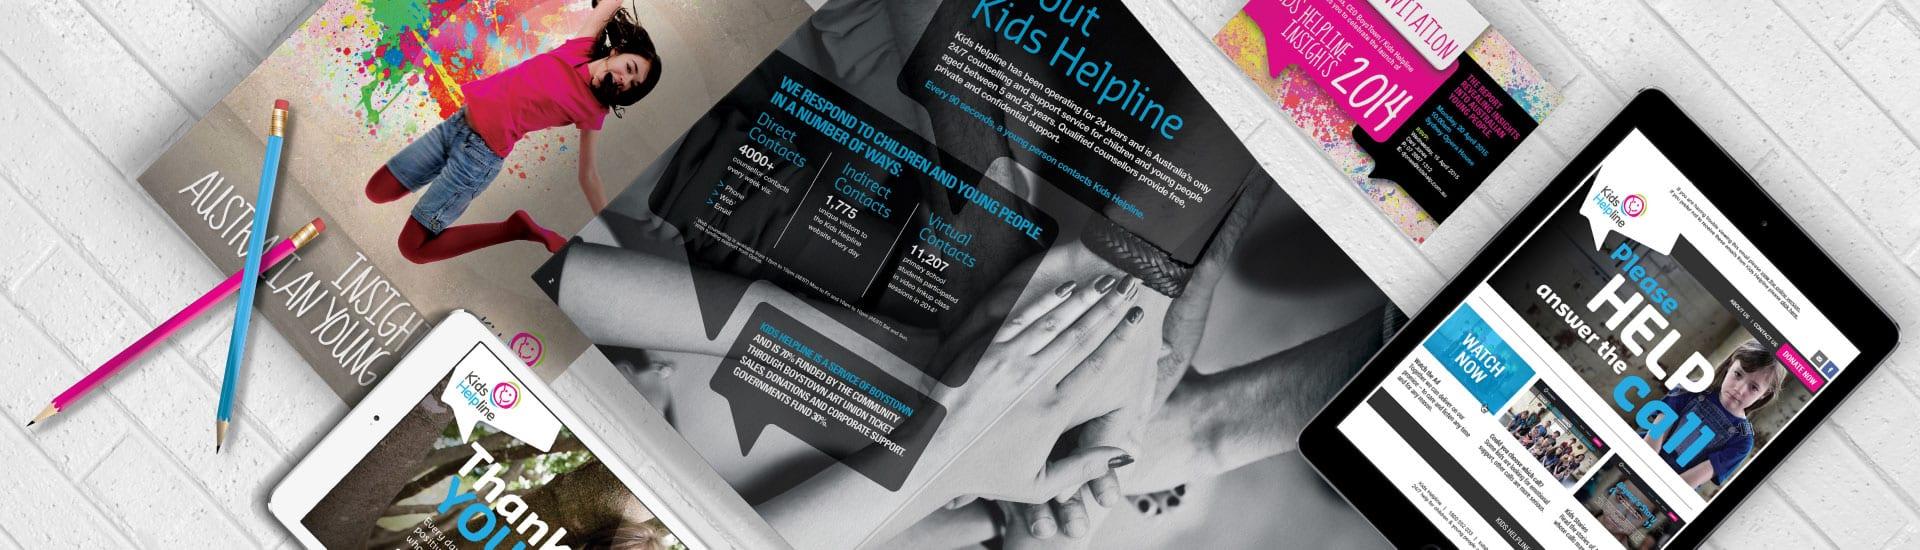 Kids Helpline Graphic Design